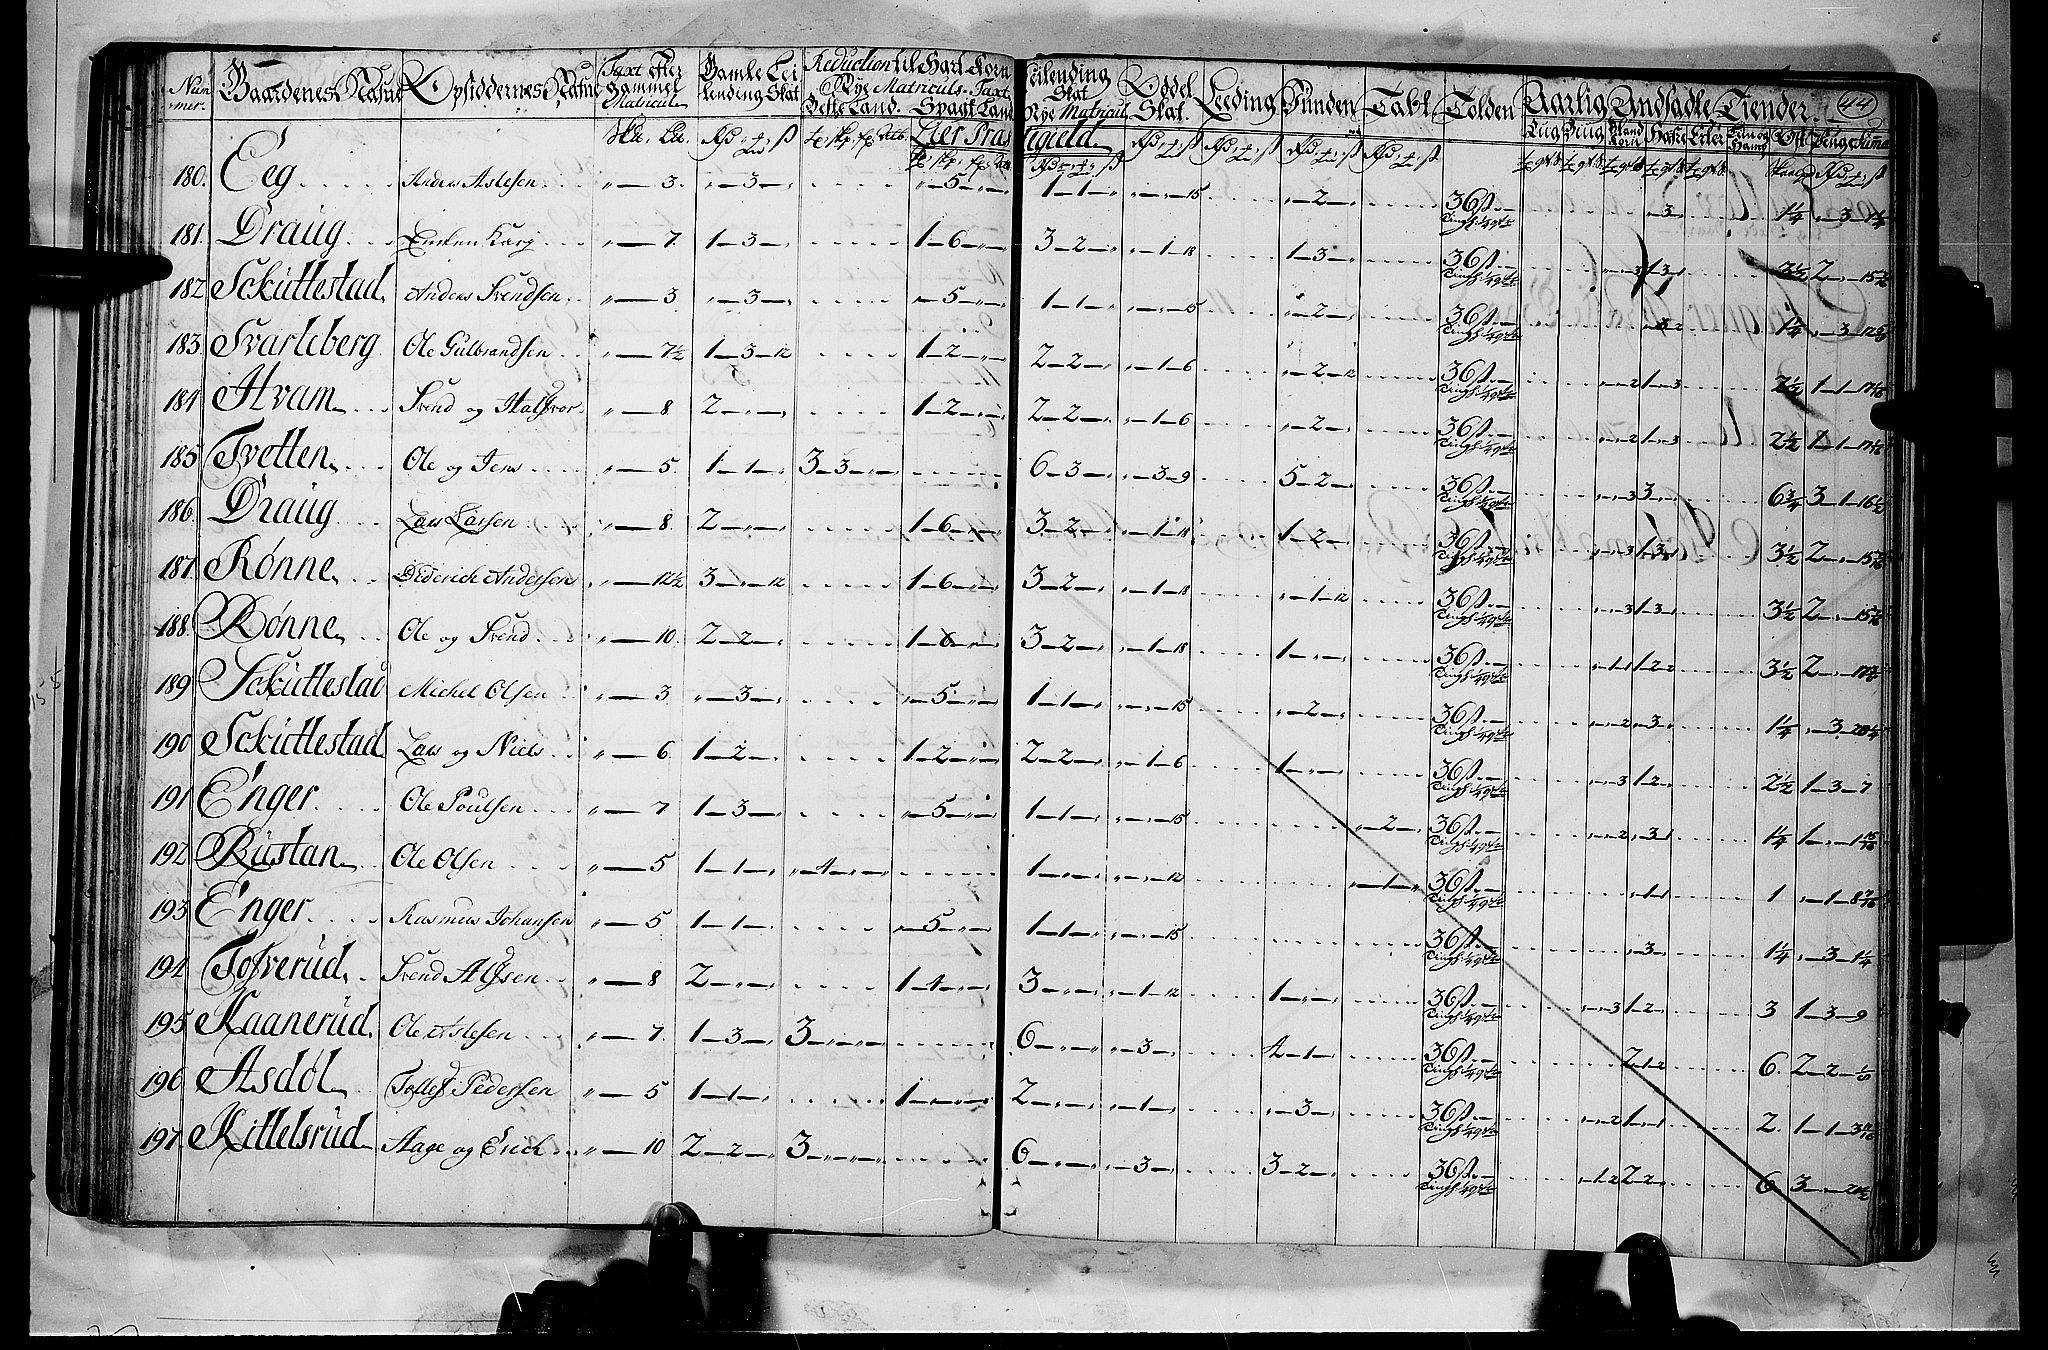 RA, Rentekammeret inntil 1814, Realistisk ordnet avdeling, N/Nb/Nbf/L0112: Buskerud matrikkelprotokoll, 1723, p. 46